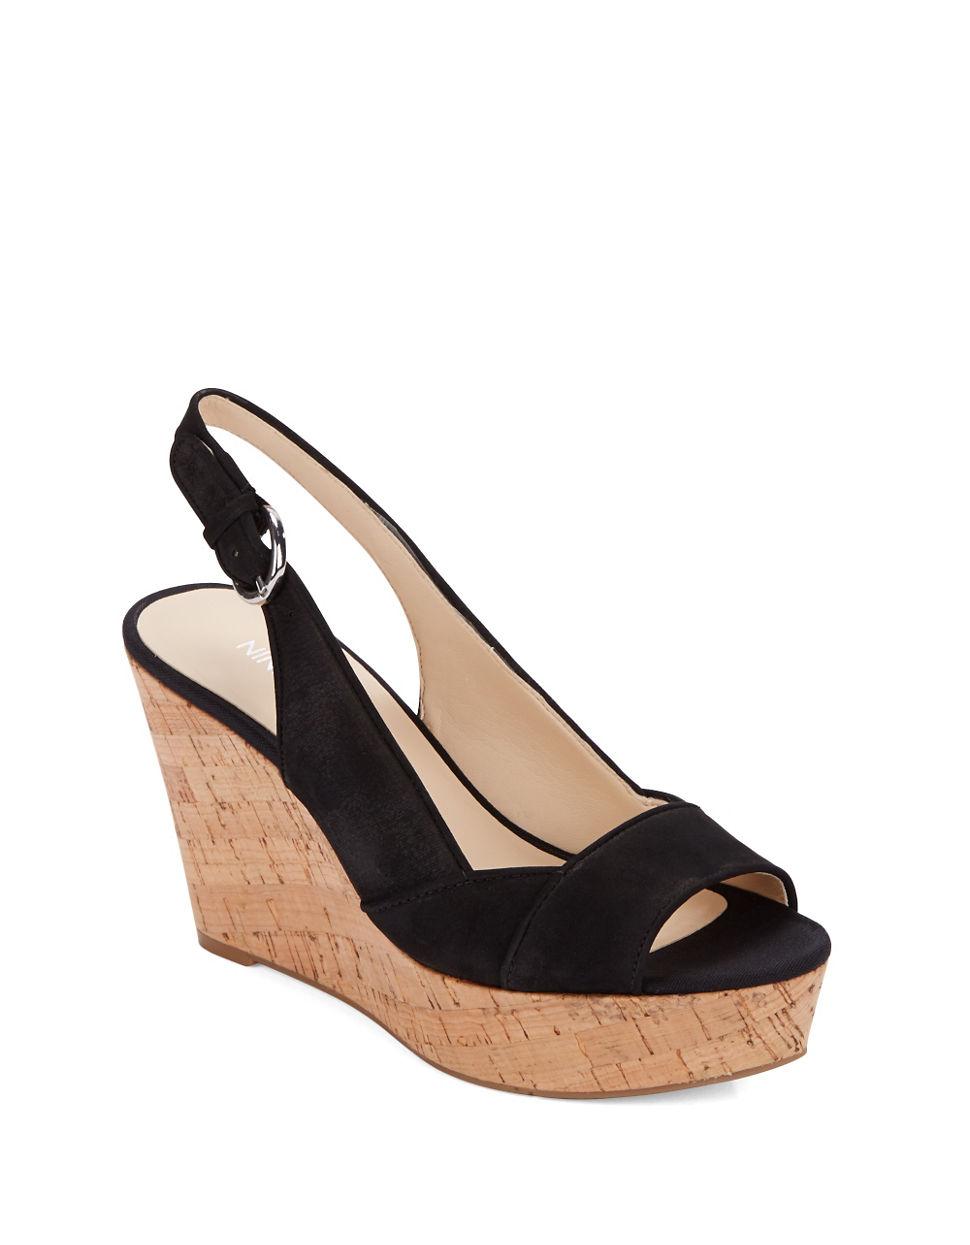 5d4a255e3d9 Lyst - Nine West Caballo Leather Platform Wedge Sandals in Black